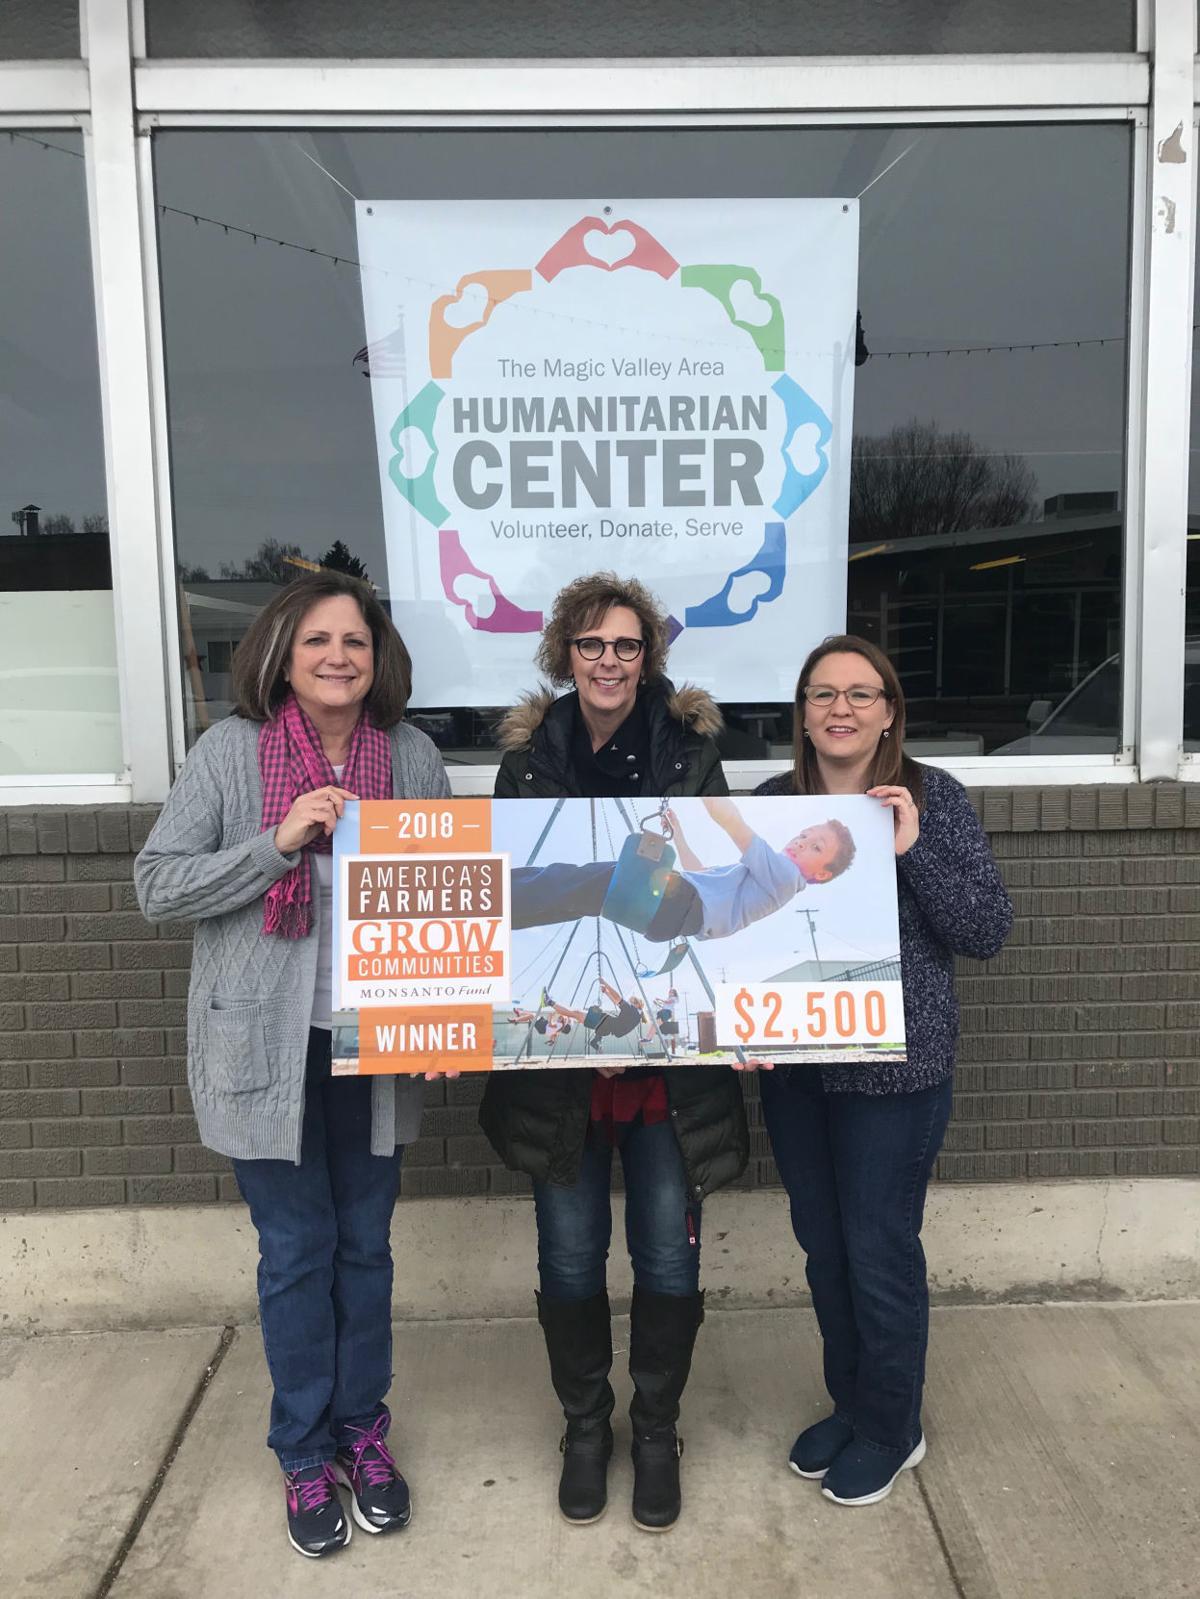 Humanitarian center donation